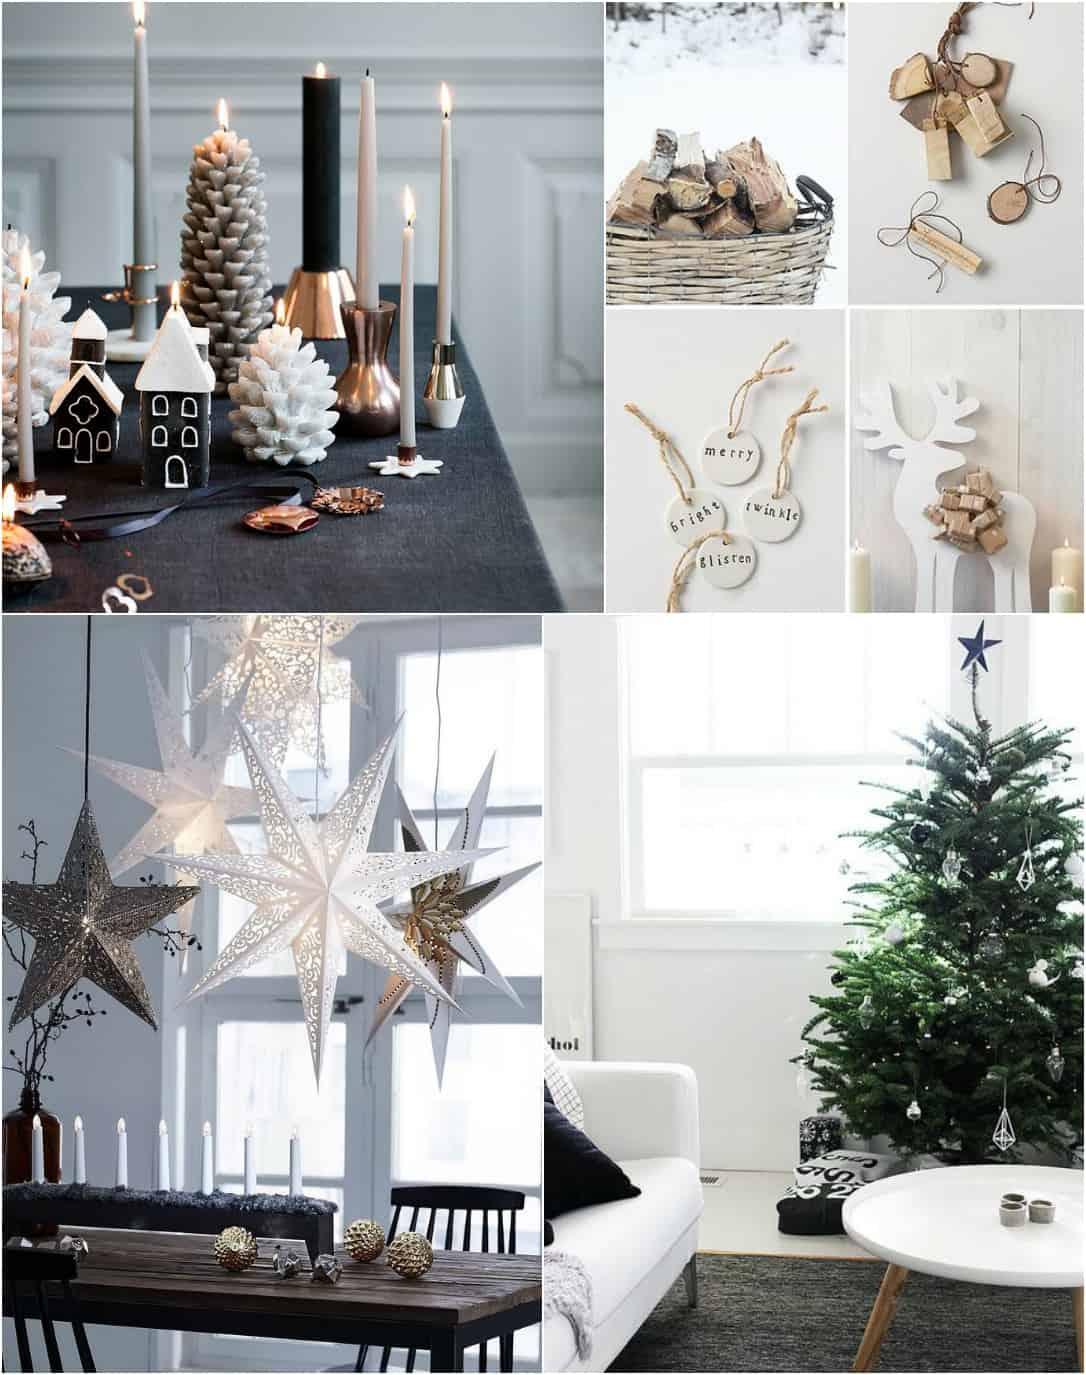 Natale Arredo  Tendenze Shabby Chic stile Scandinavo e albero Faidate